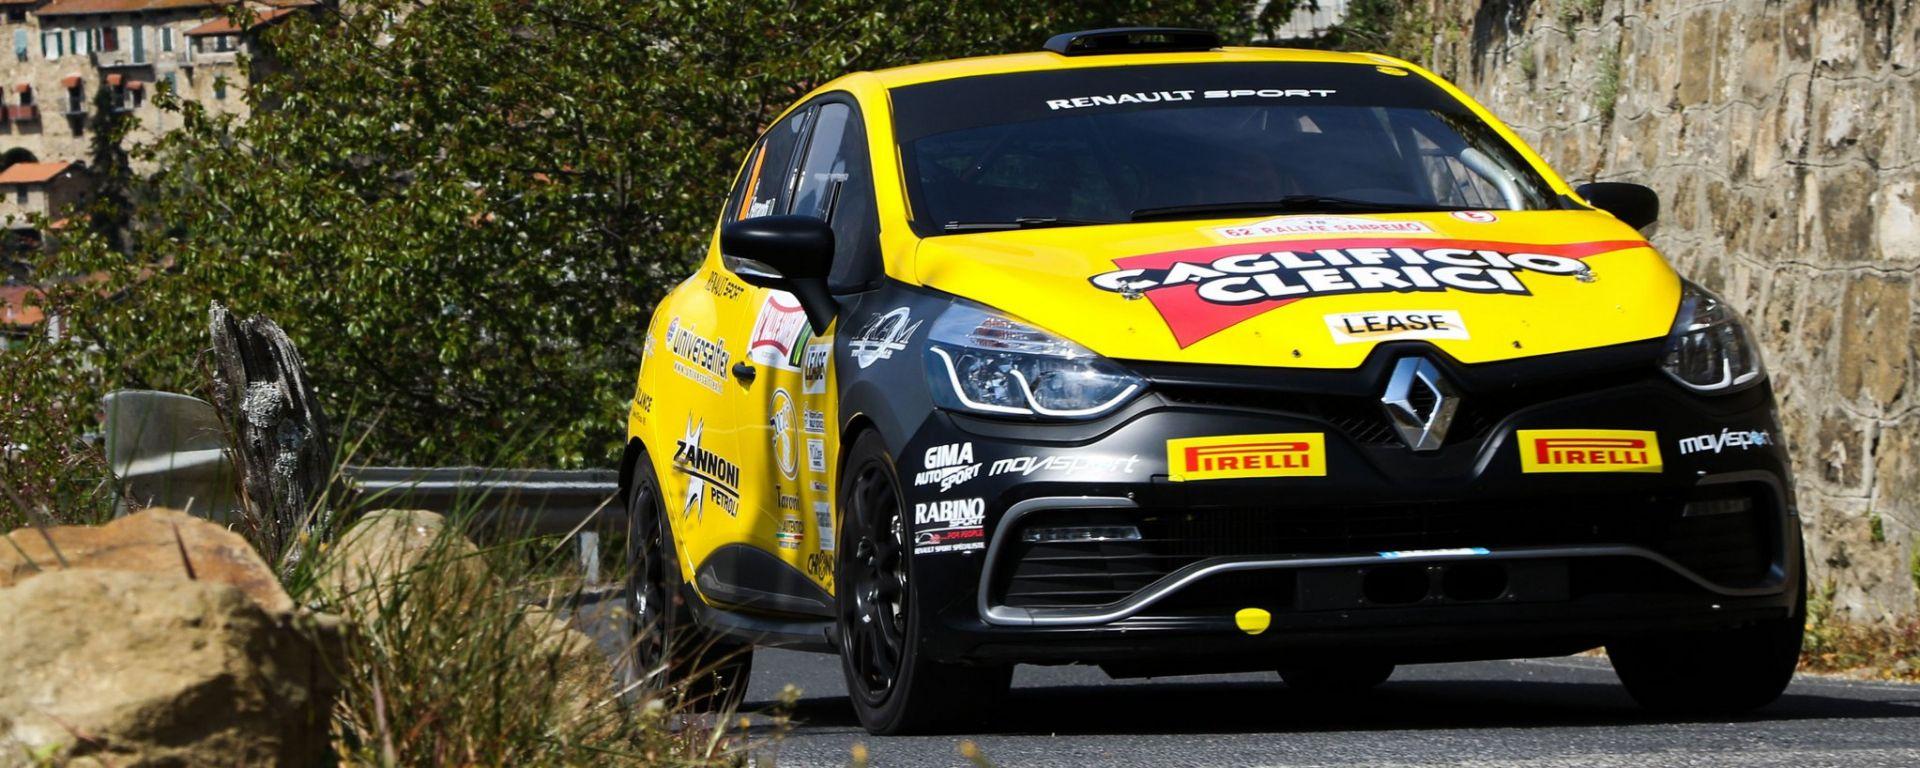 Renault e Pirelli corrono insieme